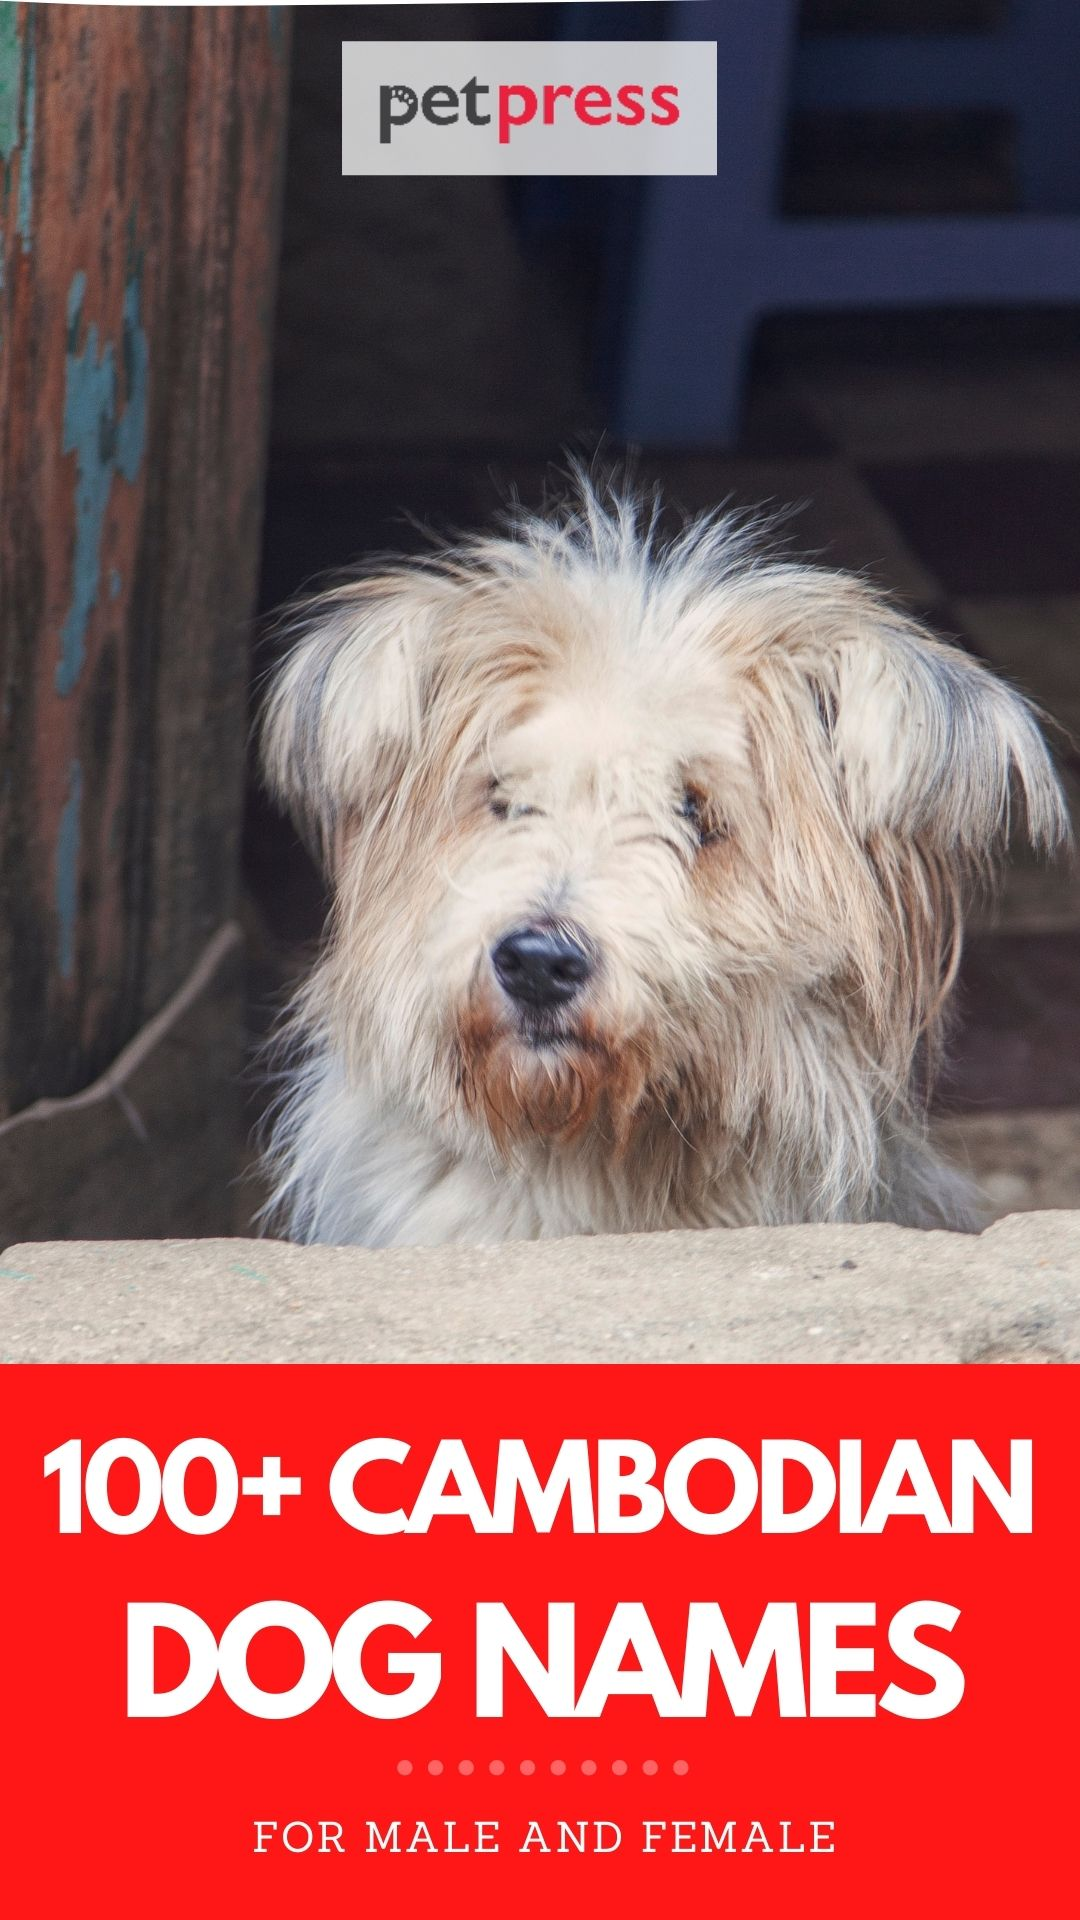 100+ cambodian dog names